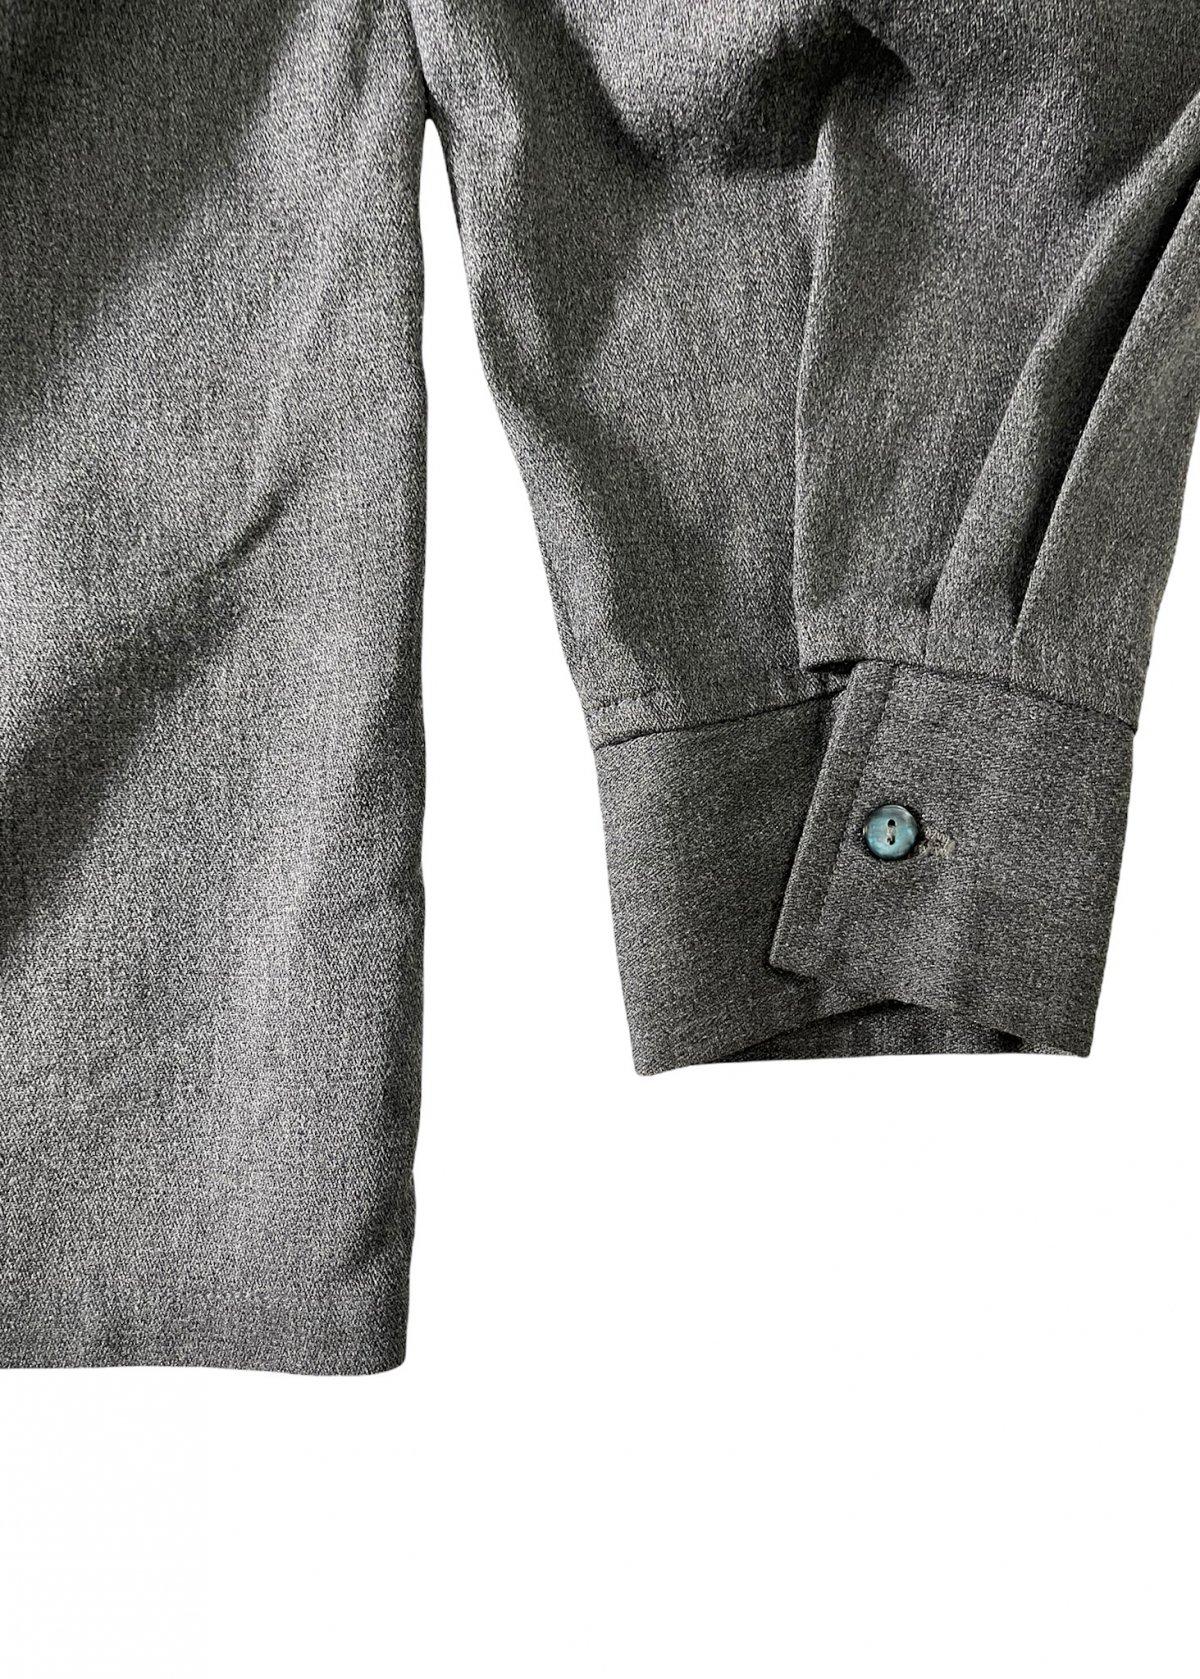 I&I 古着 通販 Vintage Wool Mix wide Shirt 詳細画像7